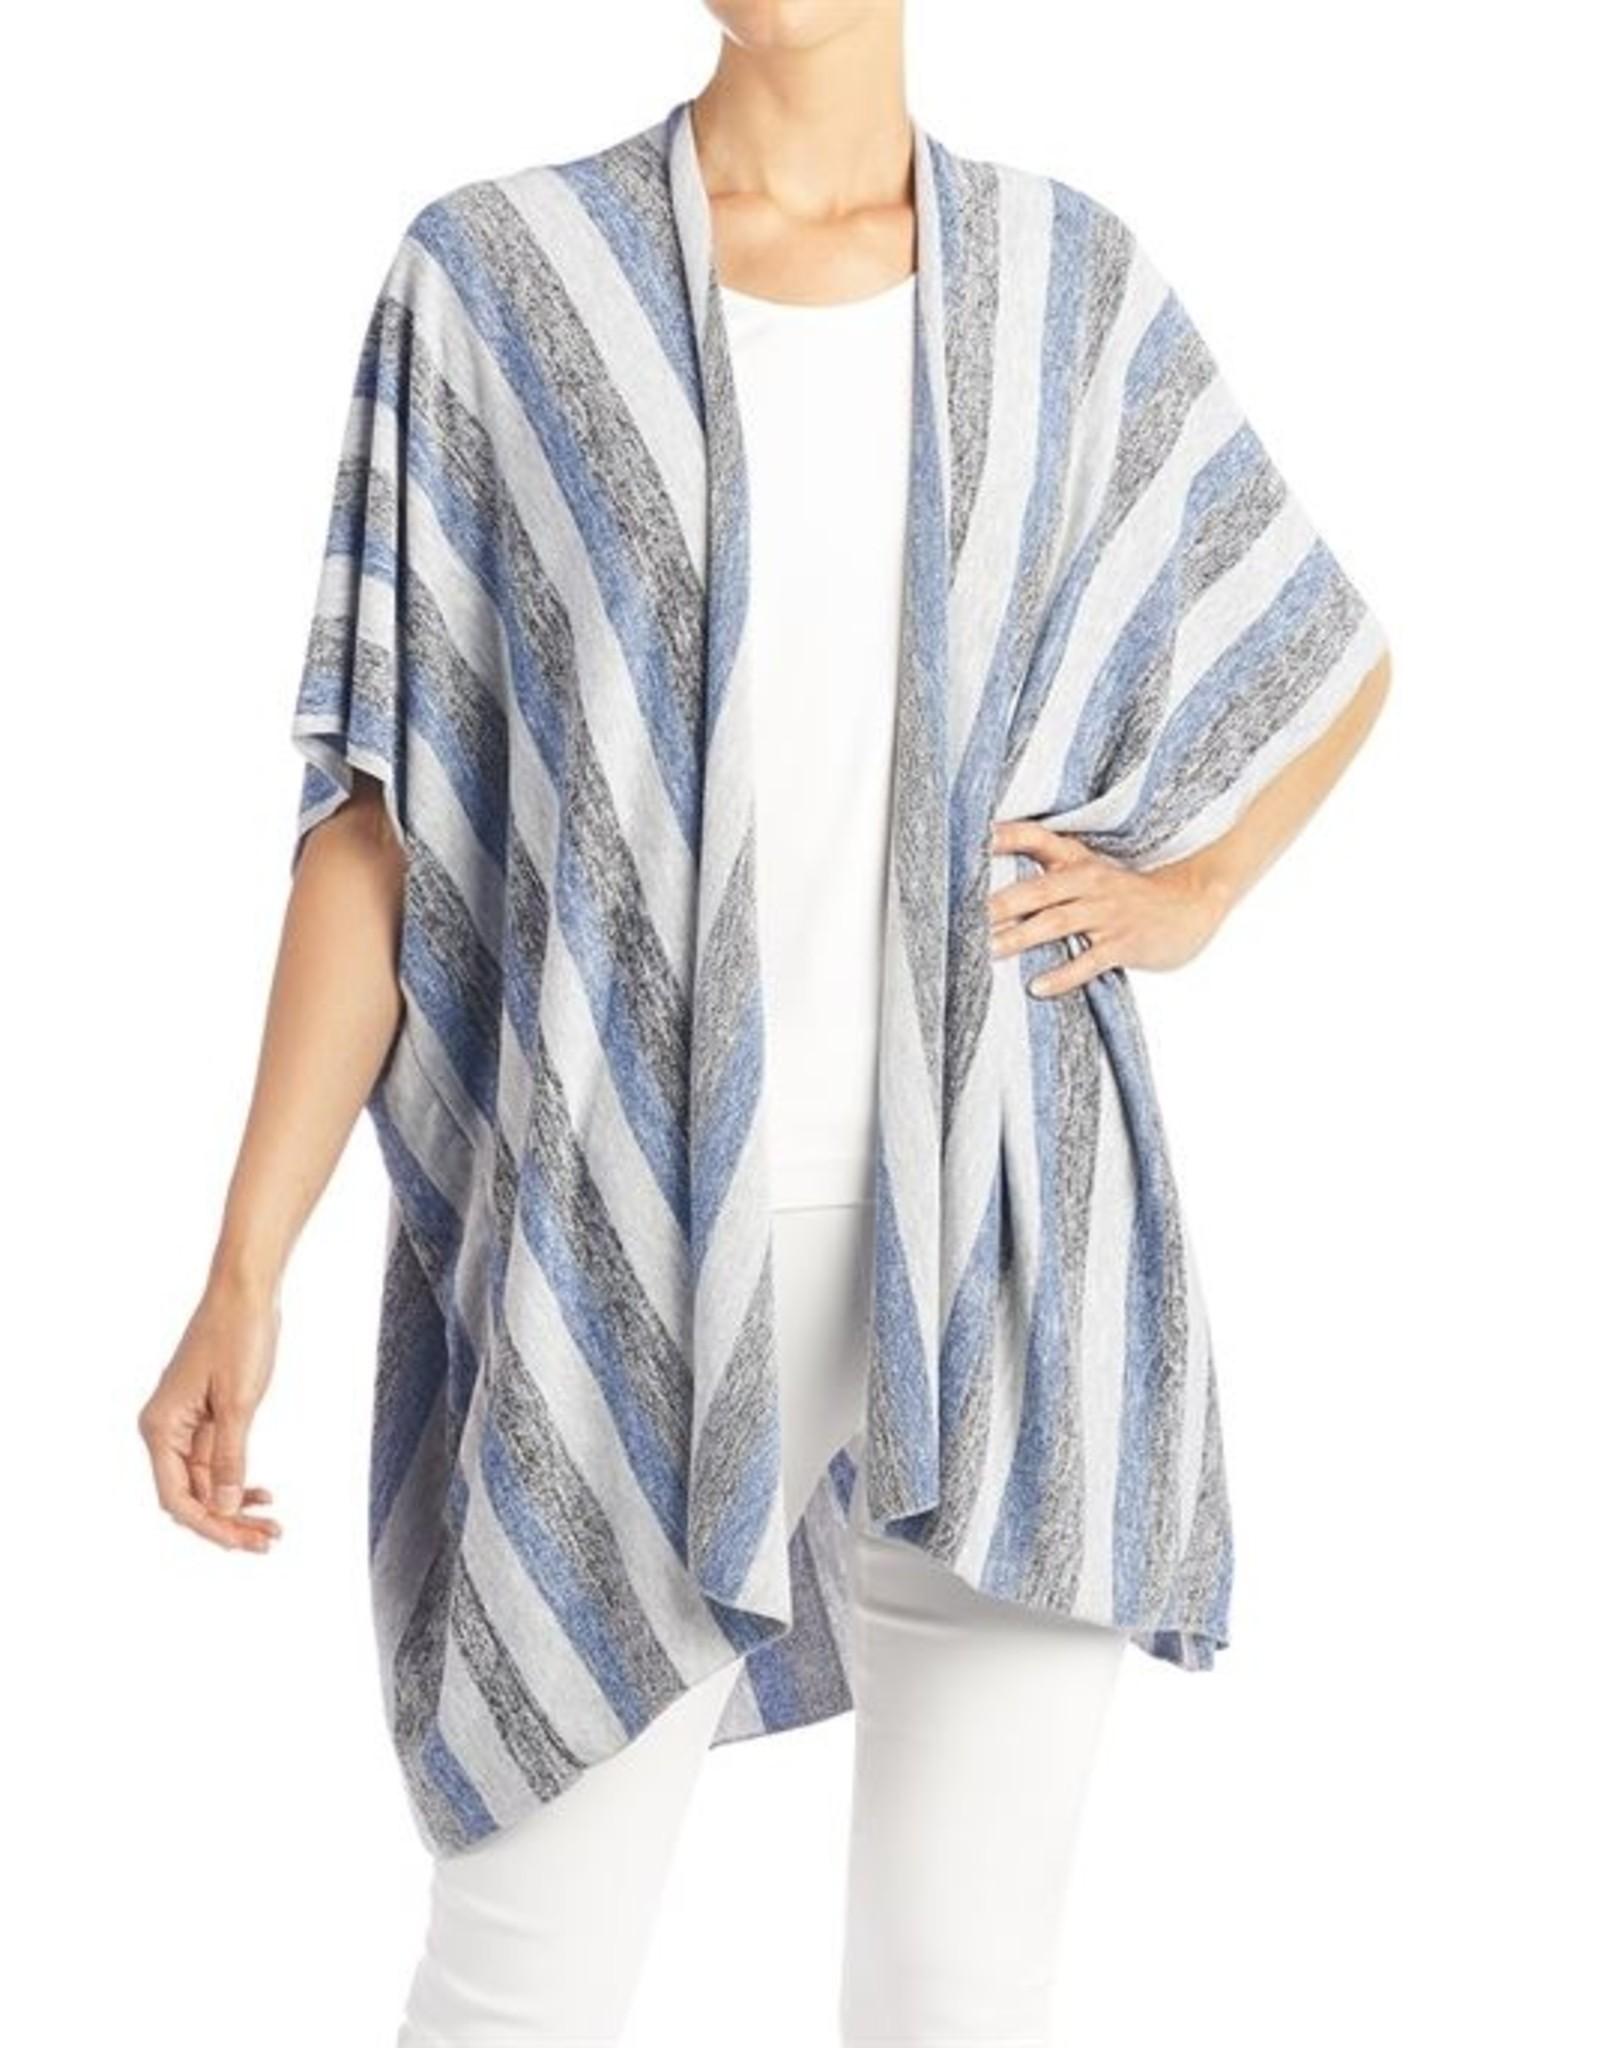 Coco & Carmen Stripe Open Knit Cardigan - Denim Stripes